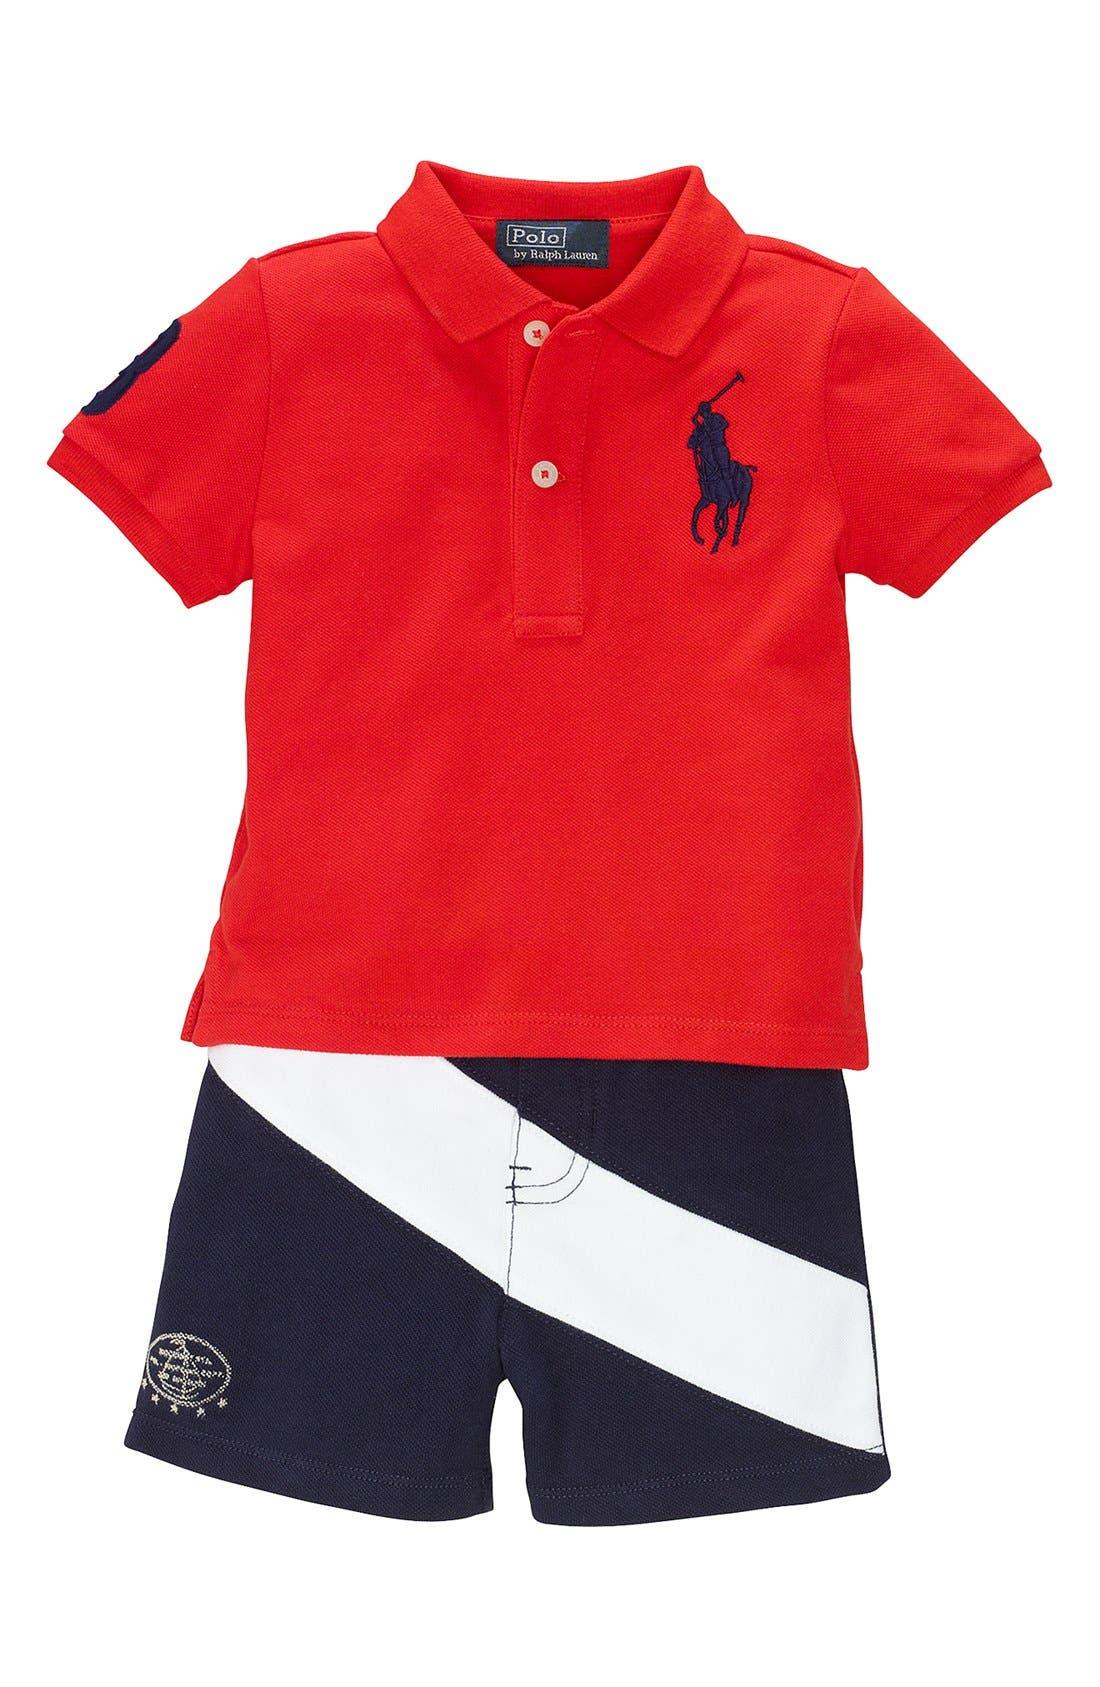 Main Image - Ralph Lauren Polo & Knit Shorts (Baby Boys)